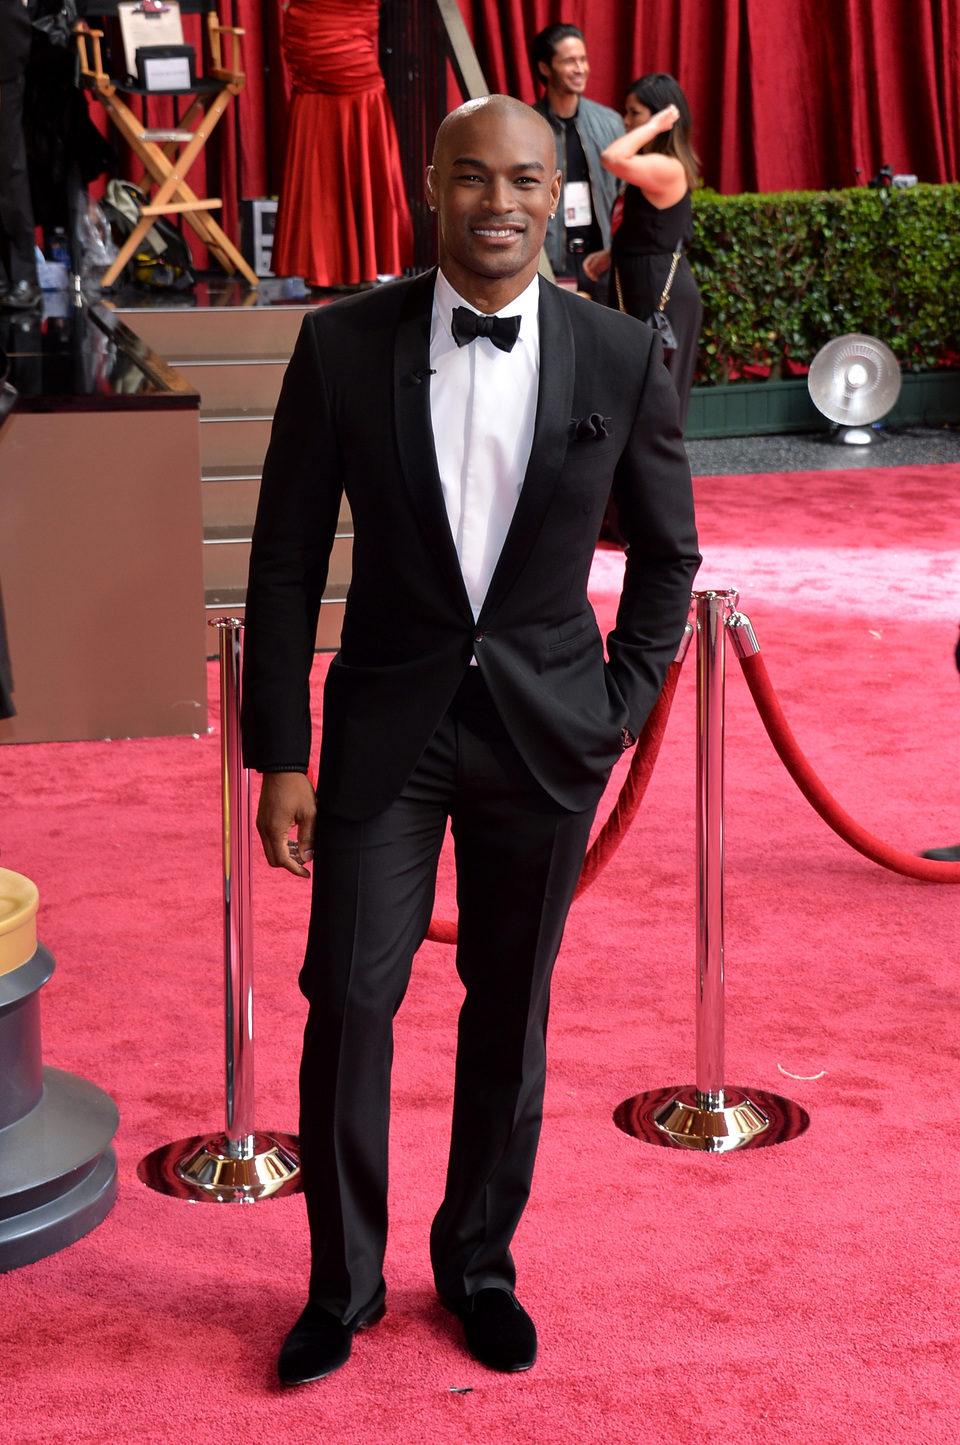 Tyson Beckford en los premios Oscar 2014